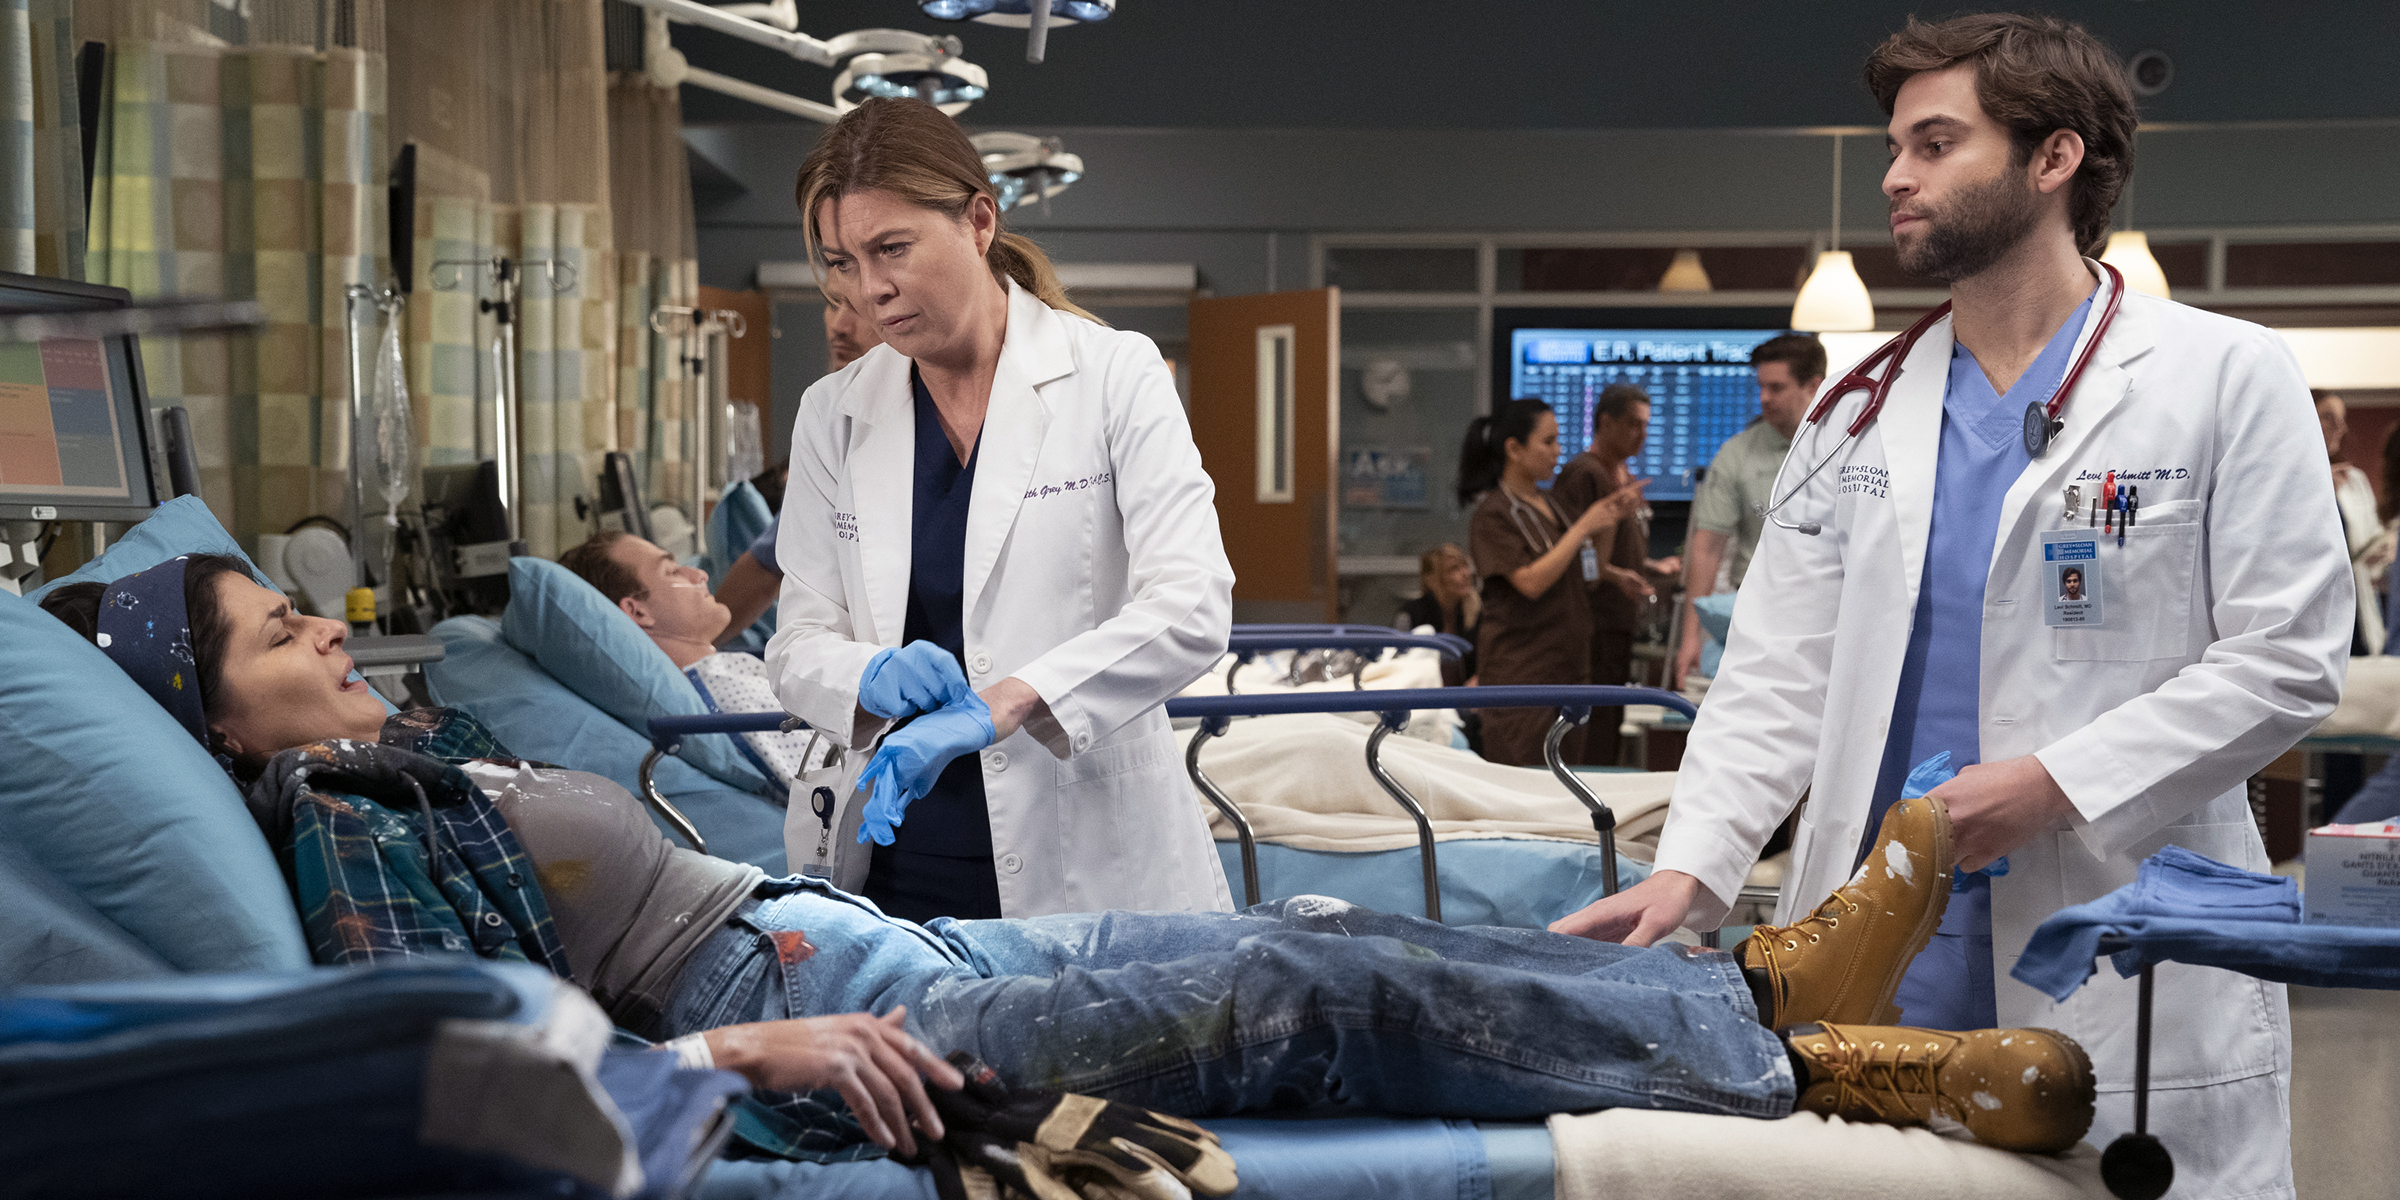 Grey's Anatomy' shuts down production amid coronavirus concerns